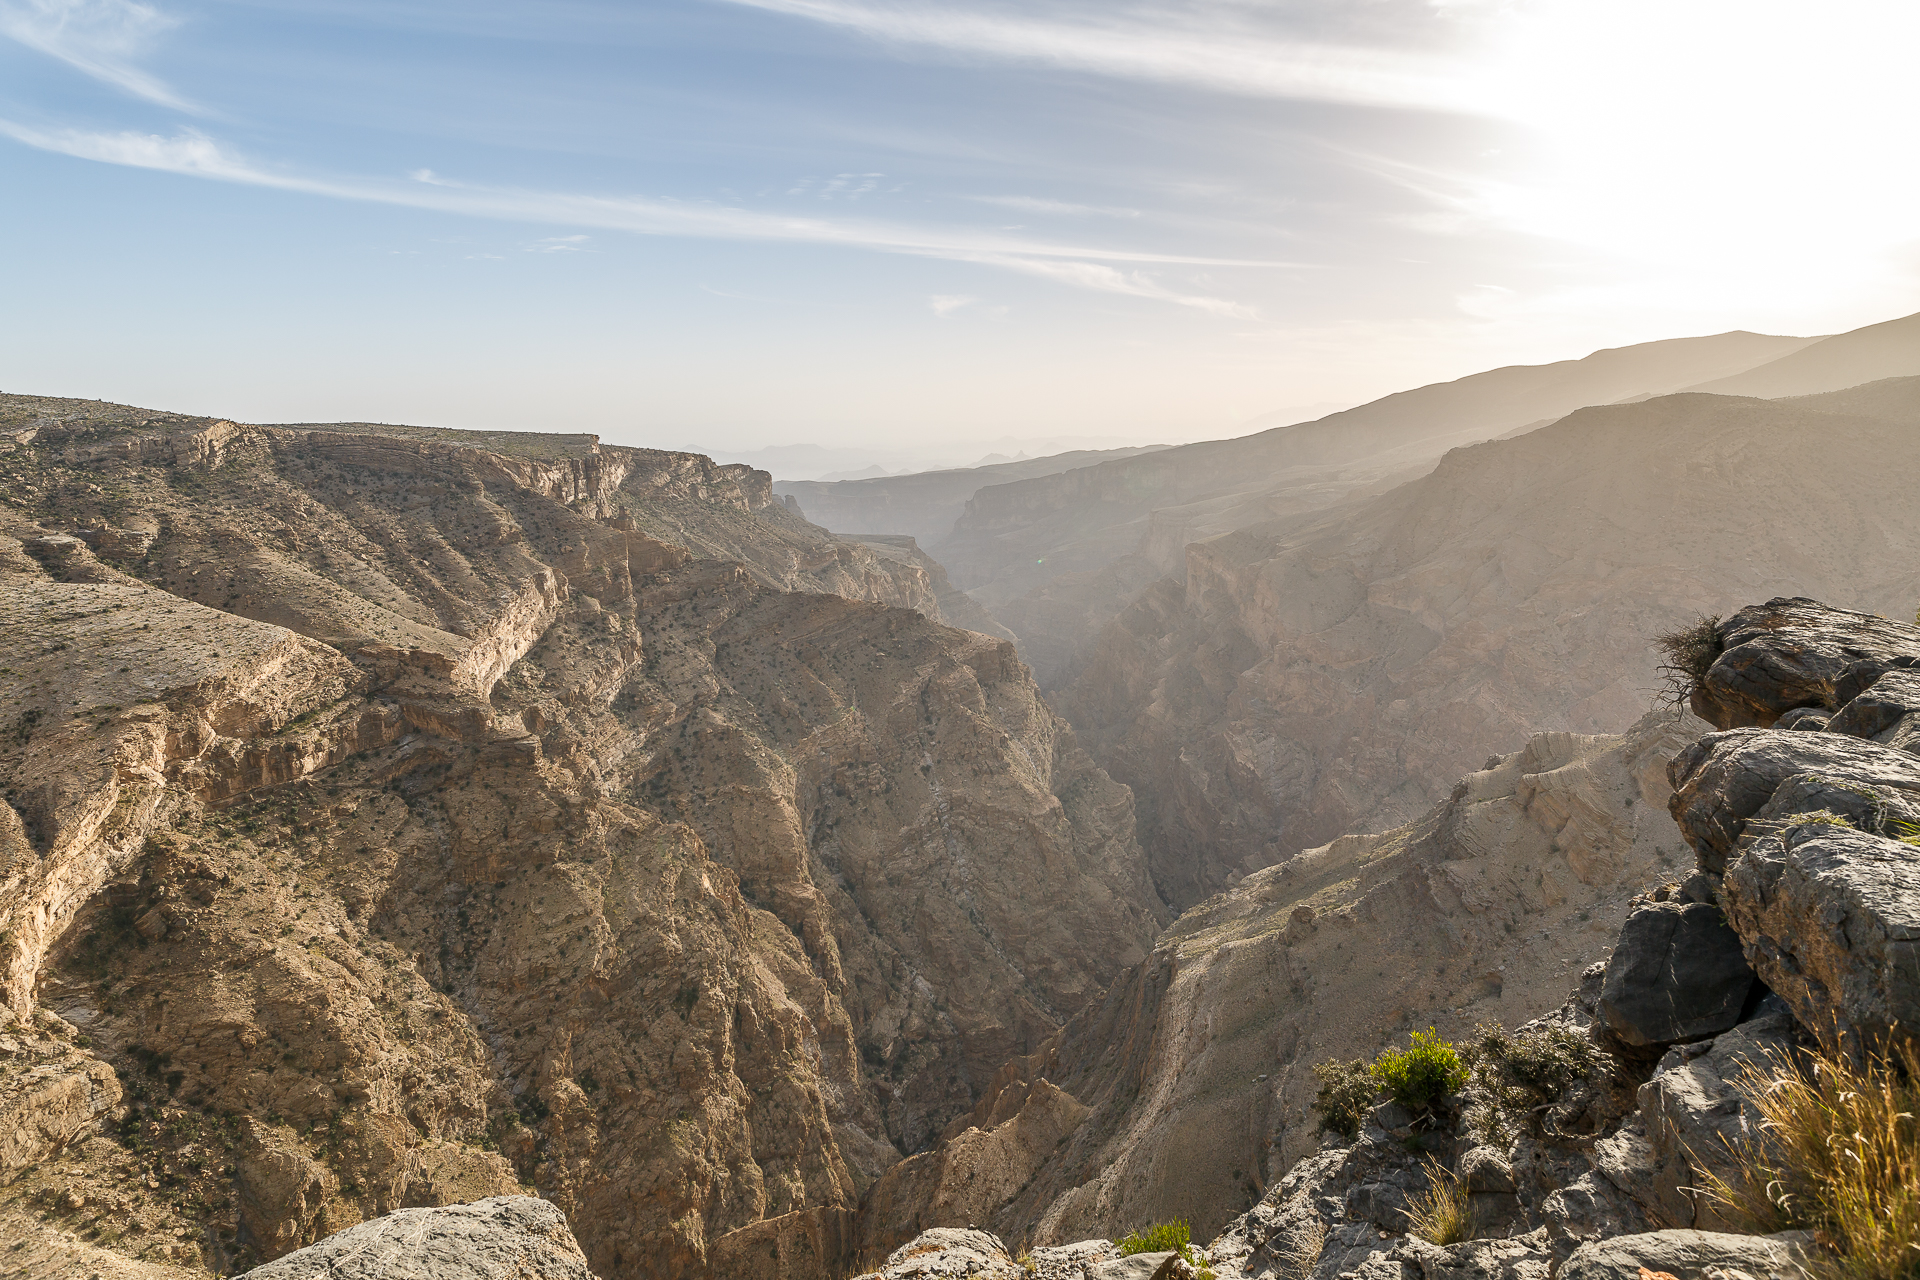 Jabal-Akhdar-Gebirge-1